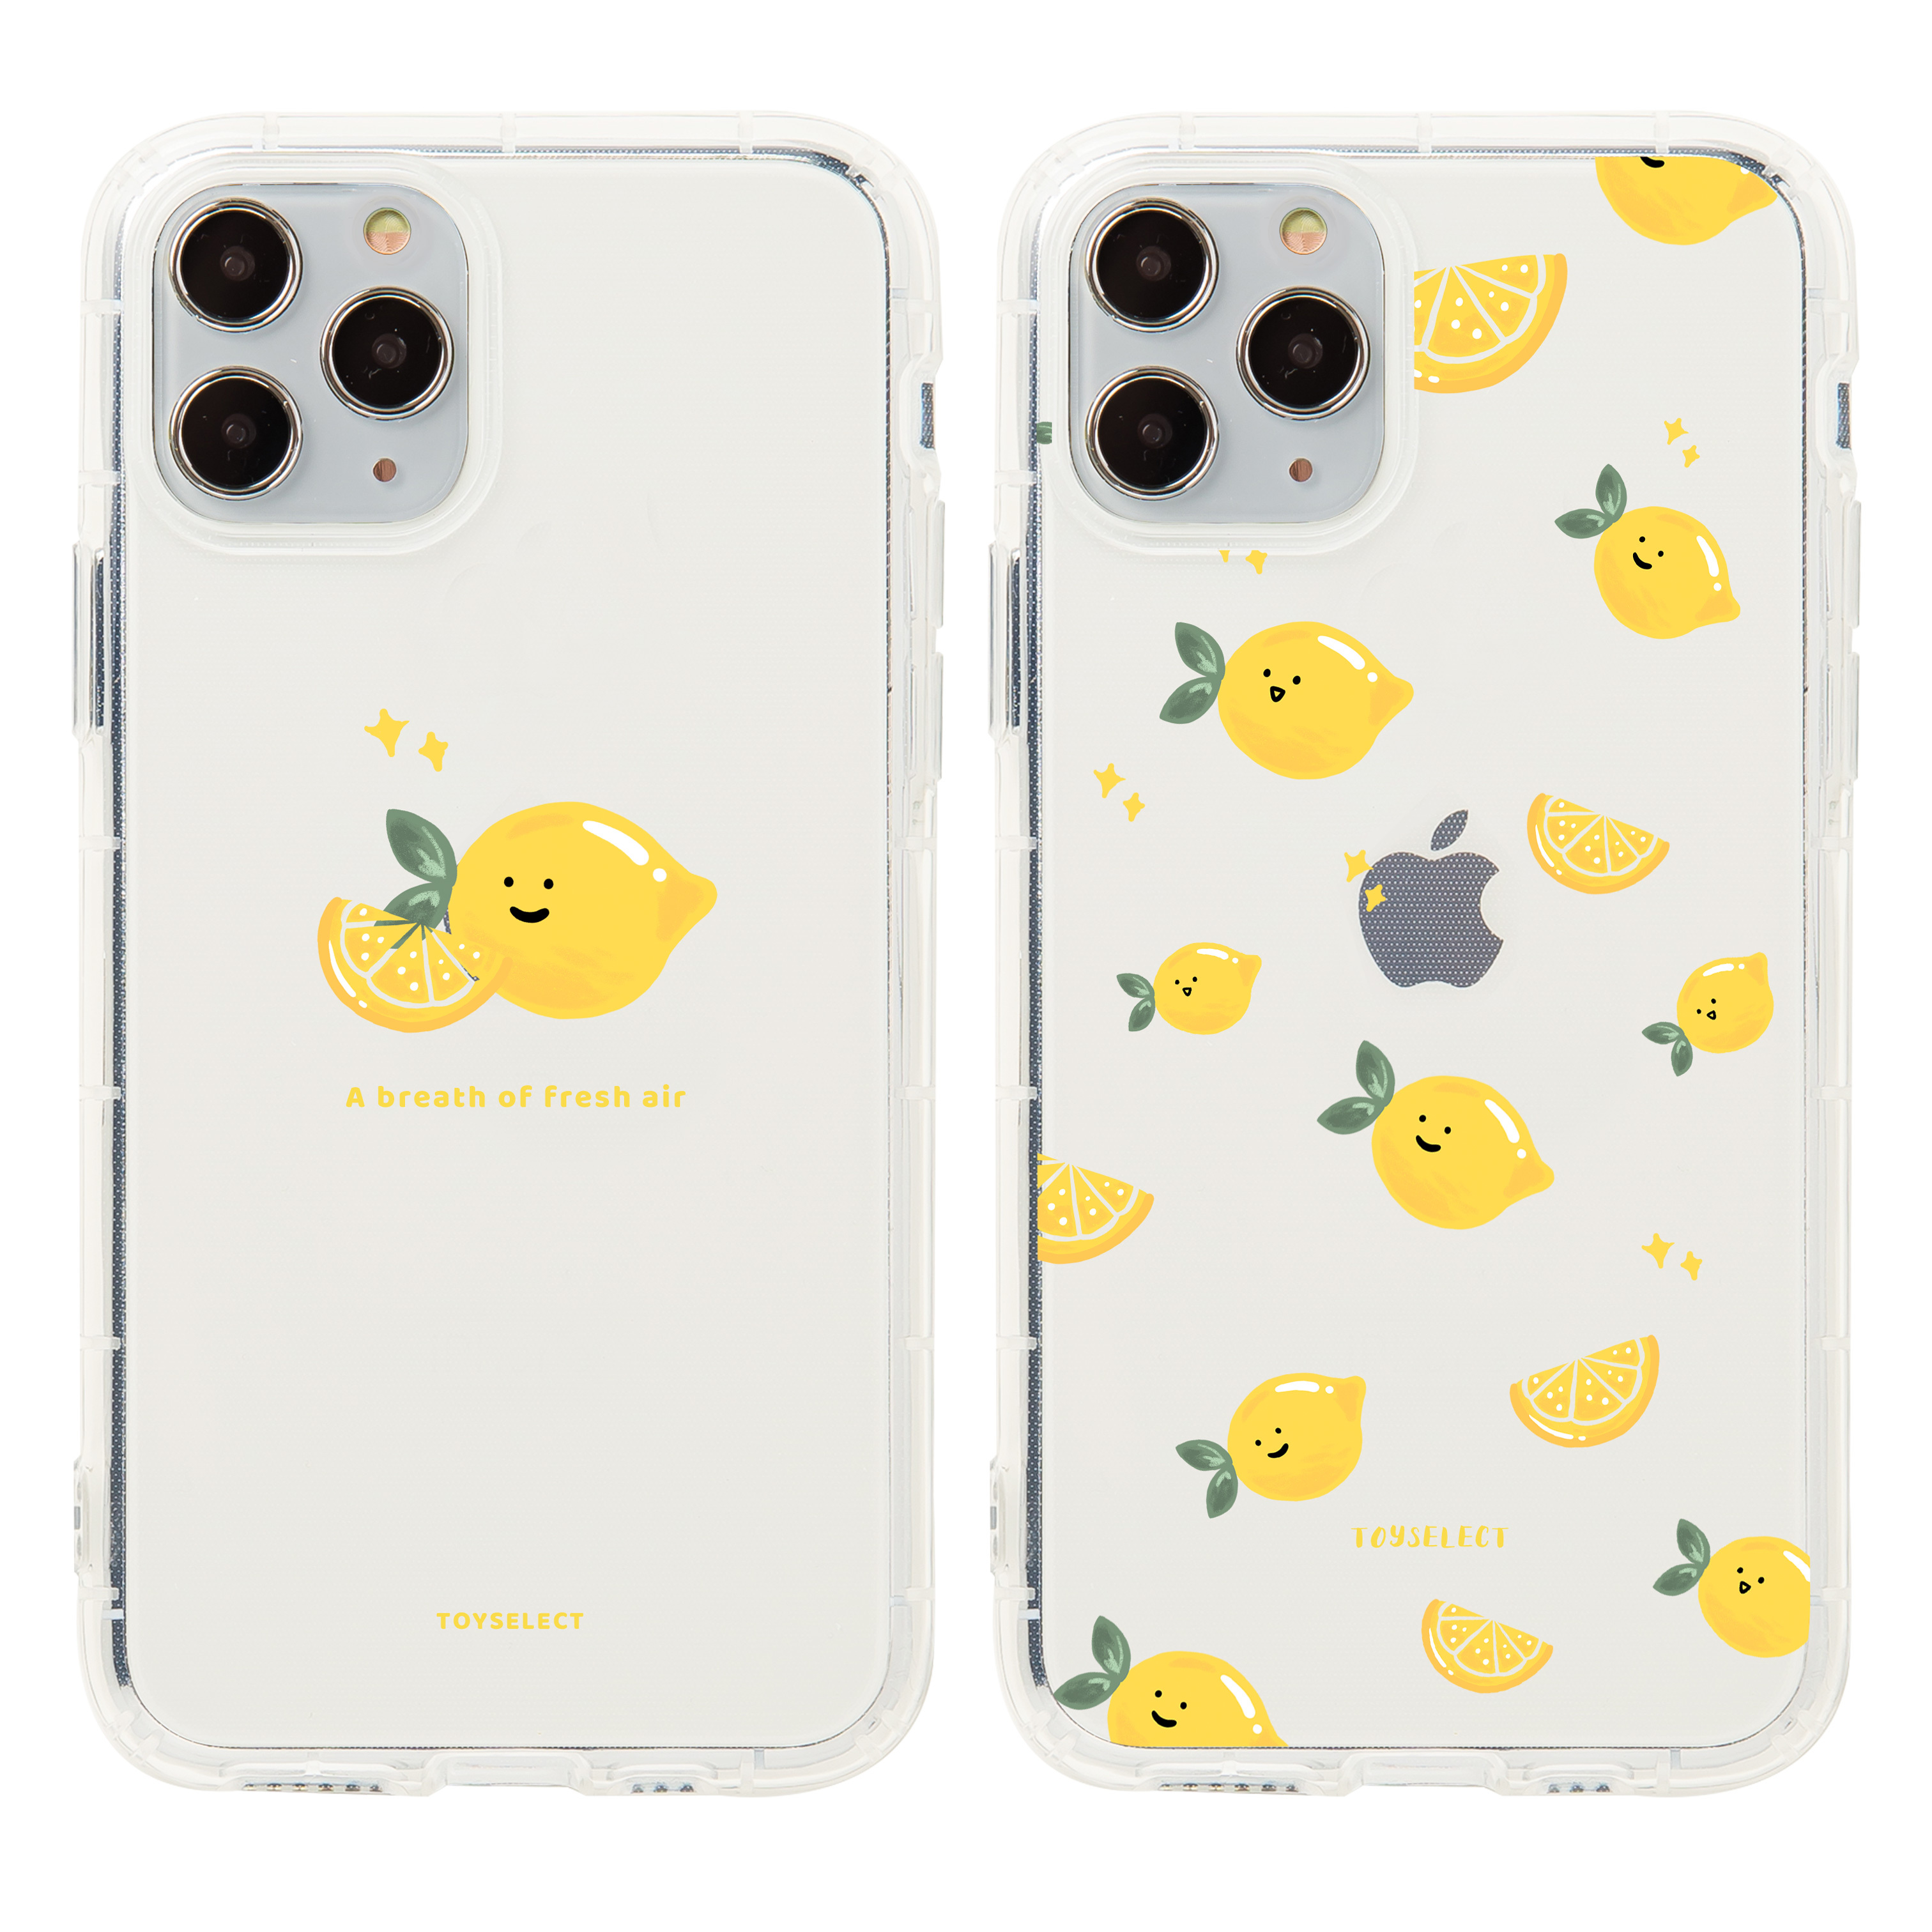 【獨家款】Smilie微笑小檸檬透明空壓iPhone手機殼